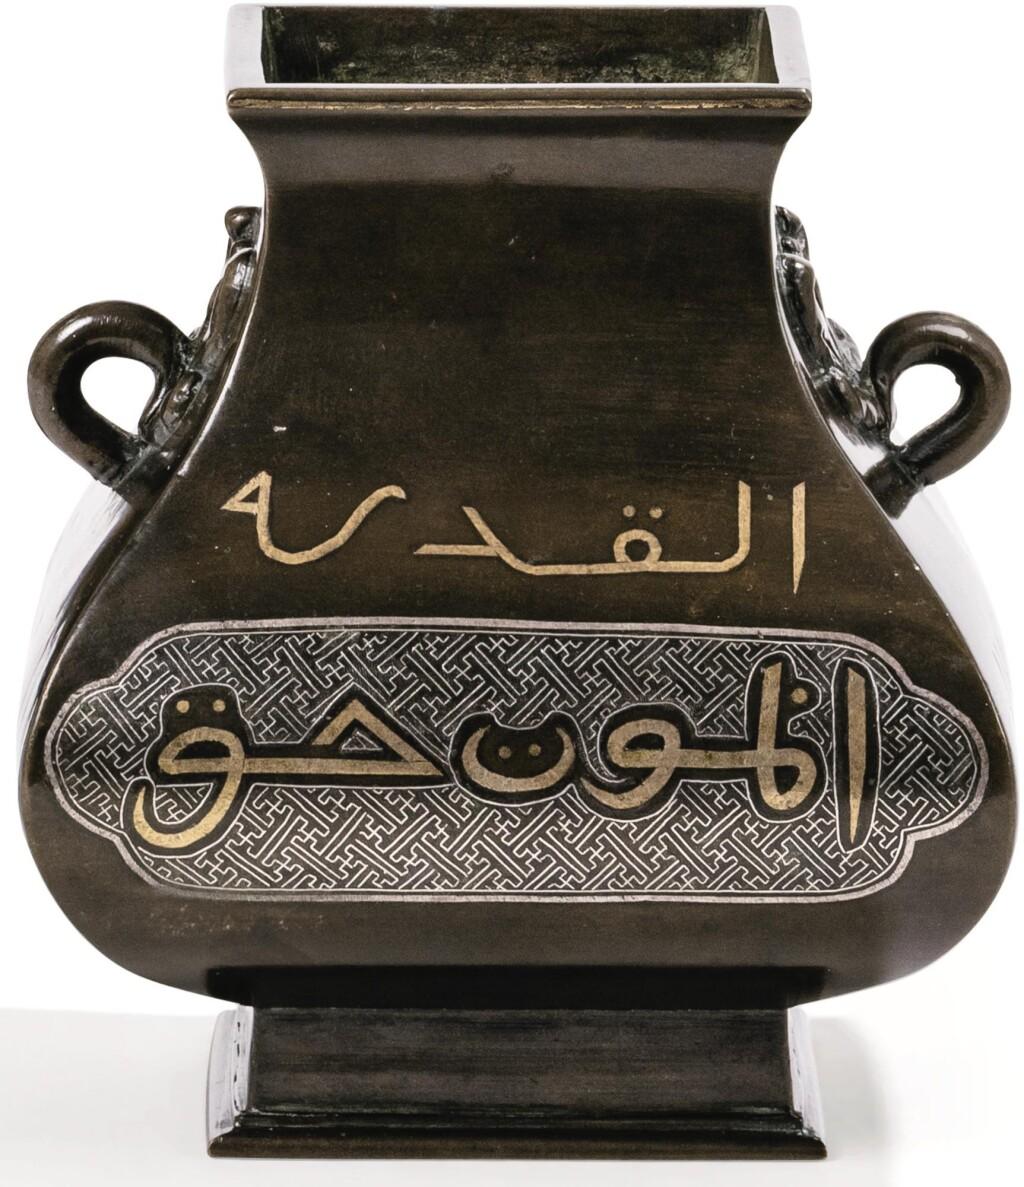 VASE EN BRONZE INCRUSTÉ D'OR ET D'ARGENT DYNASTIE QING  清 銅錯金銀亞拉伯文雙耳方壺 《大明宣德年製》仿款 | A gold and silver-inlaid bronze vase with arabic inscription, Qing Dynasty